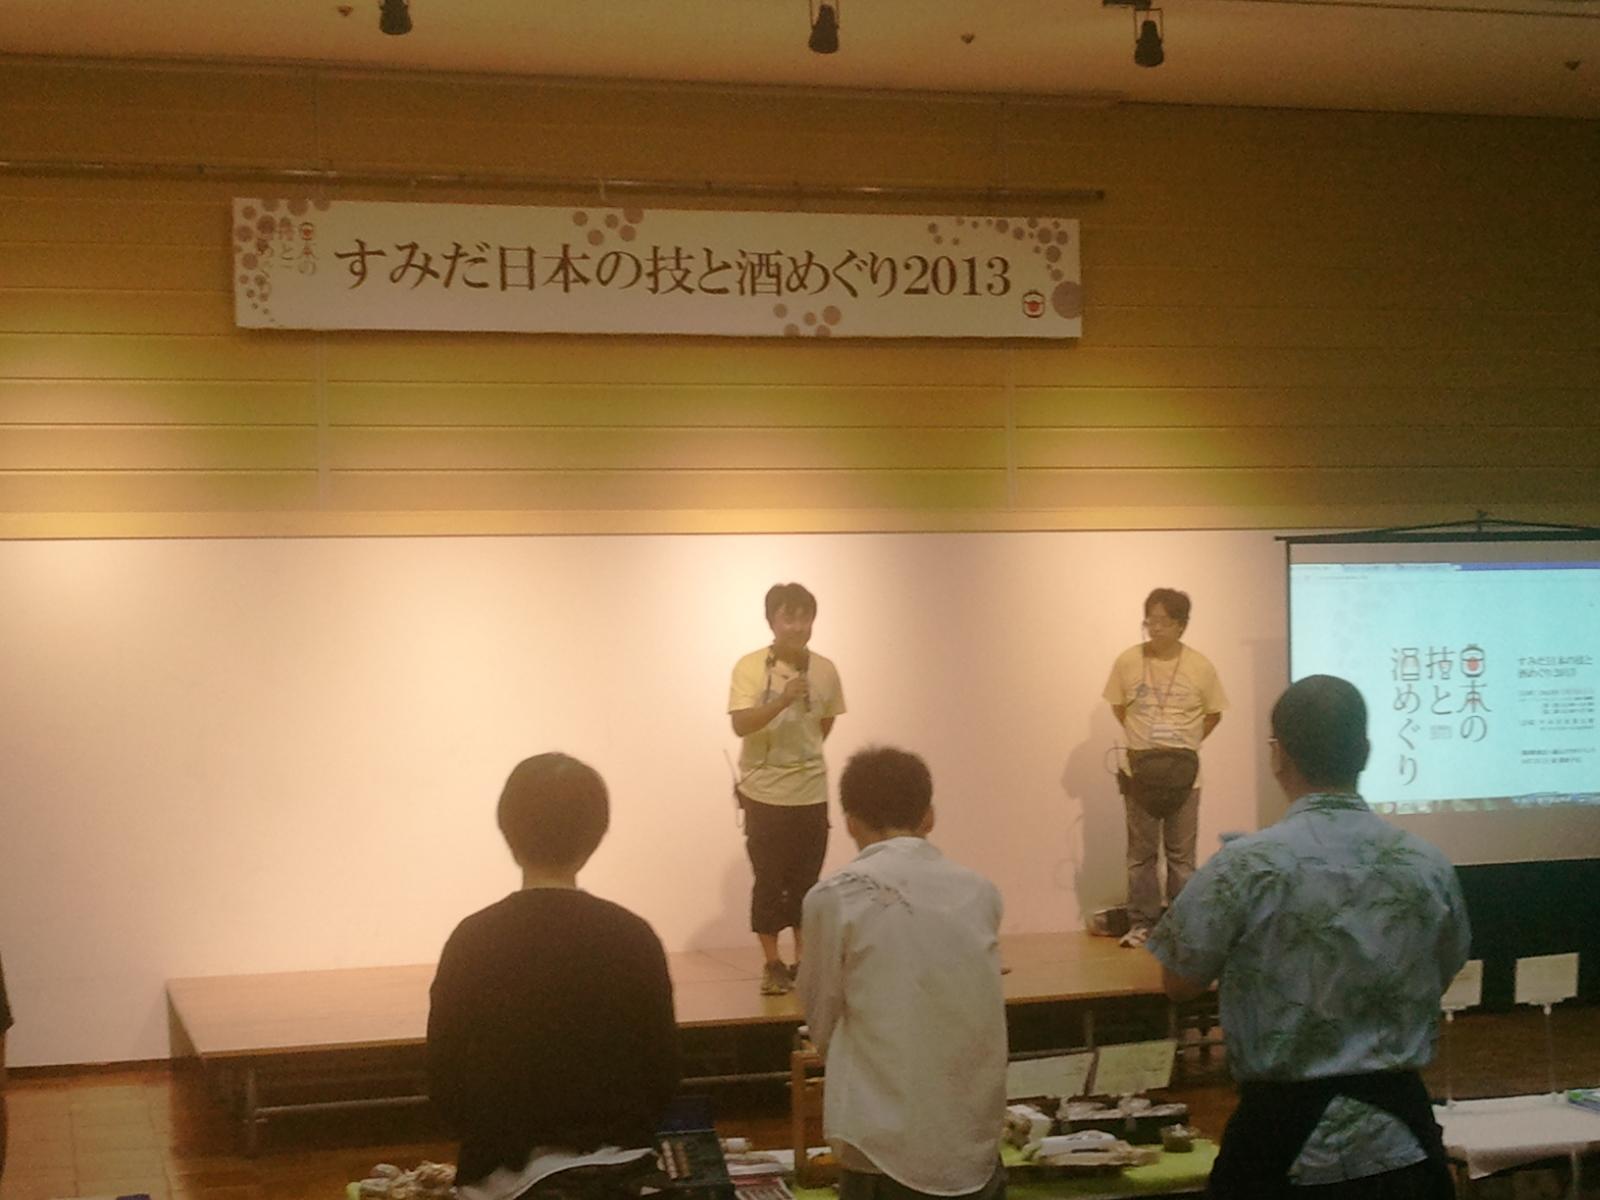 2013-09-08_11-38-00